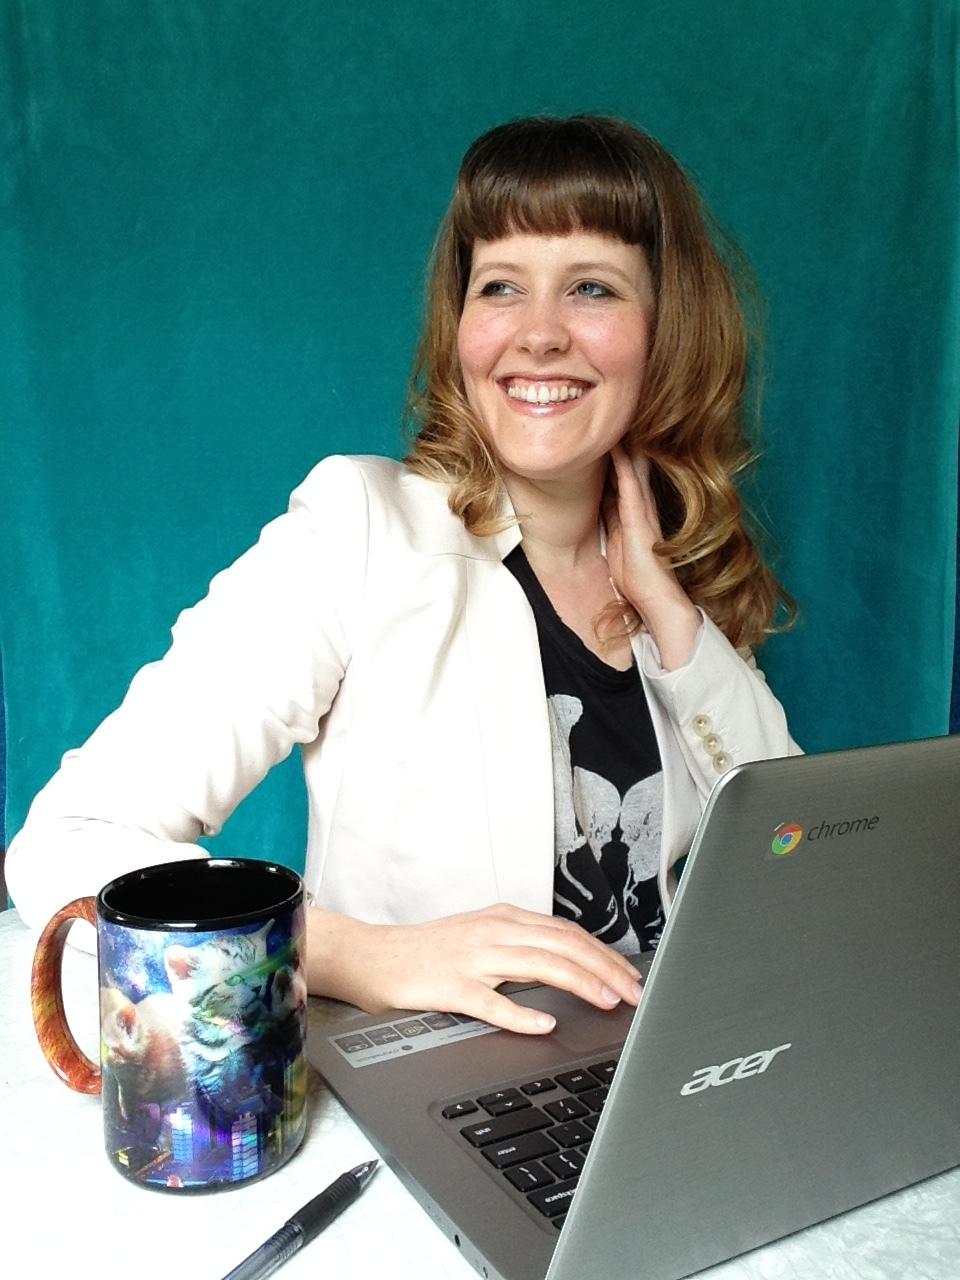 Writing rehab marketing blog posts